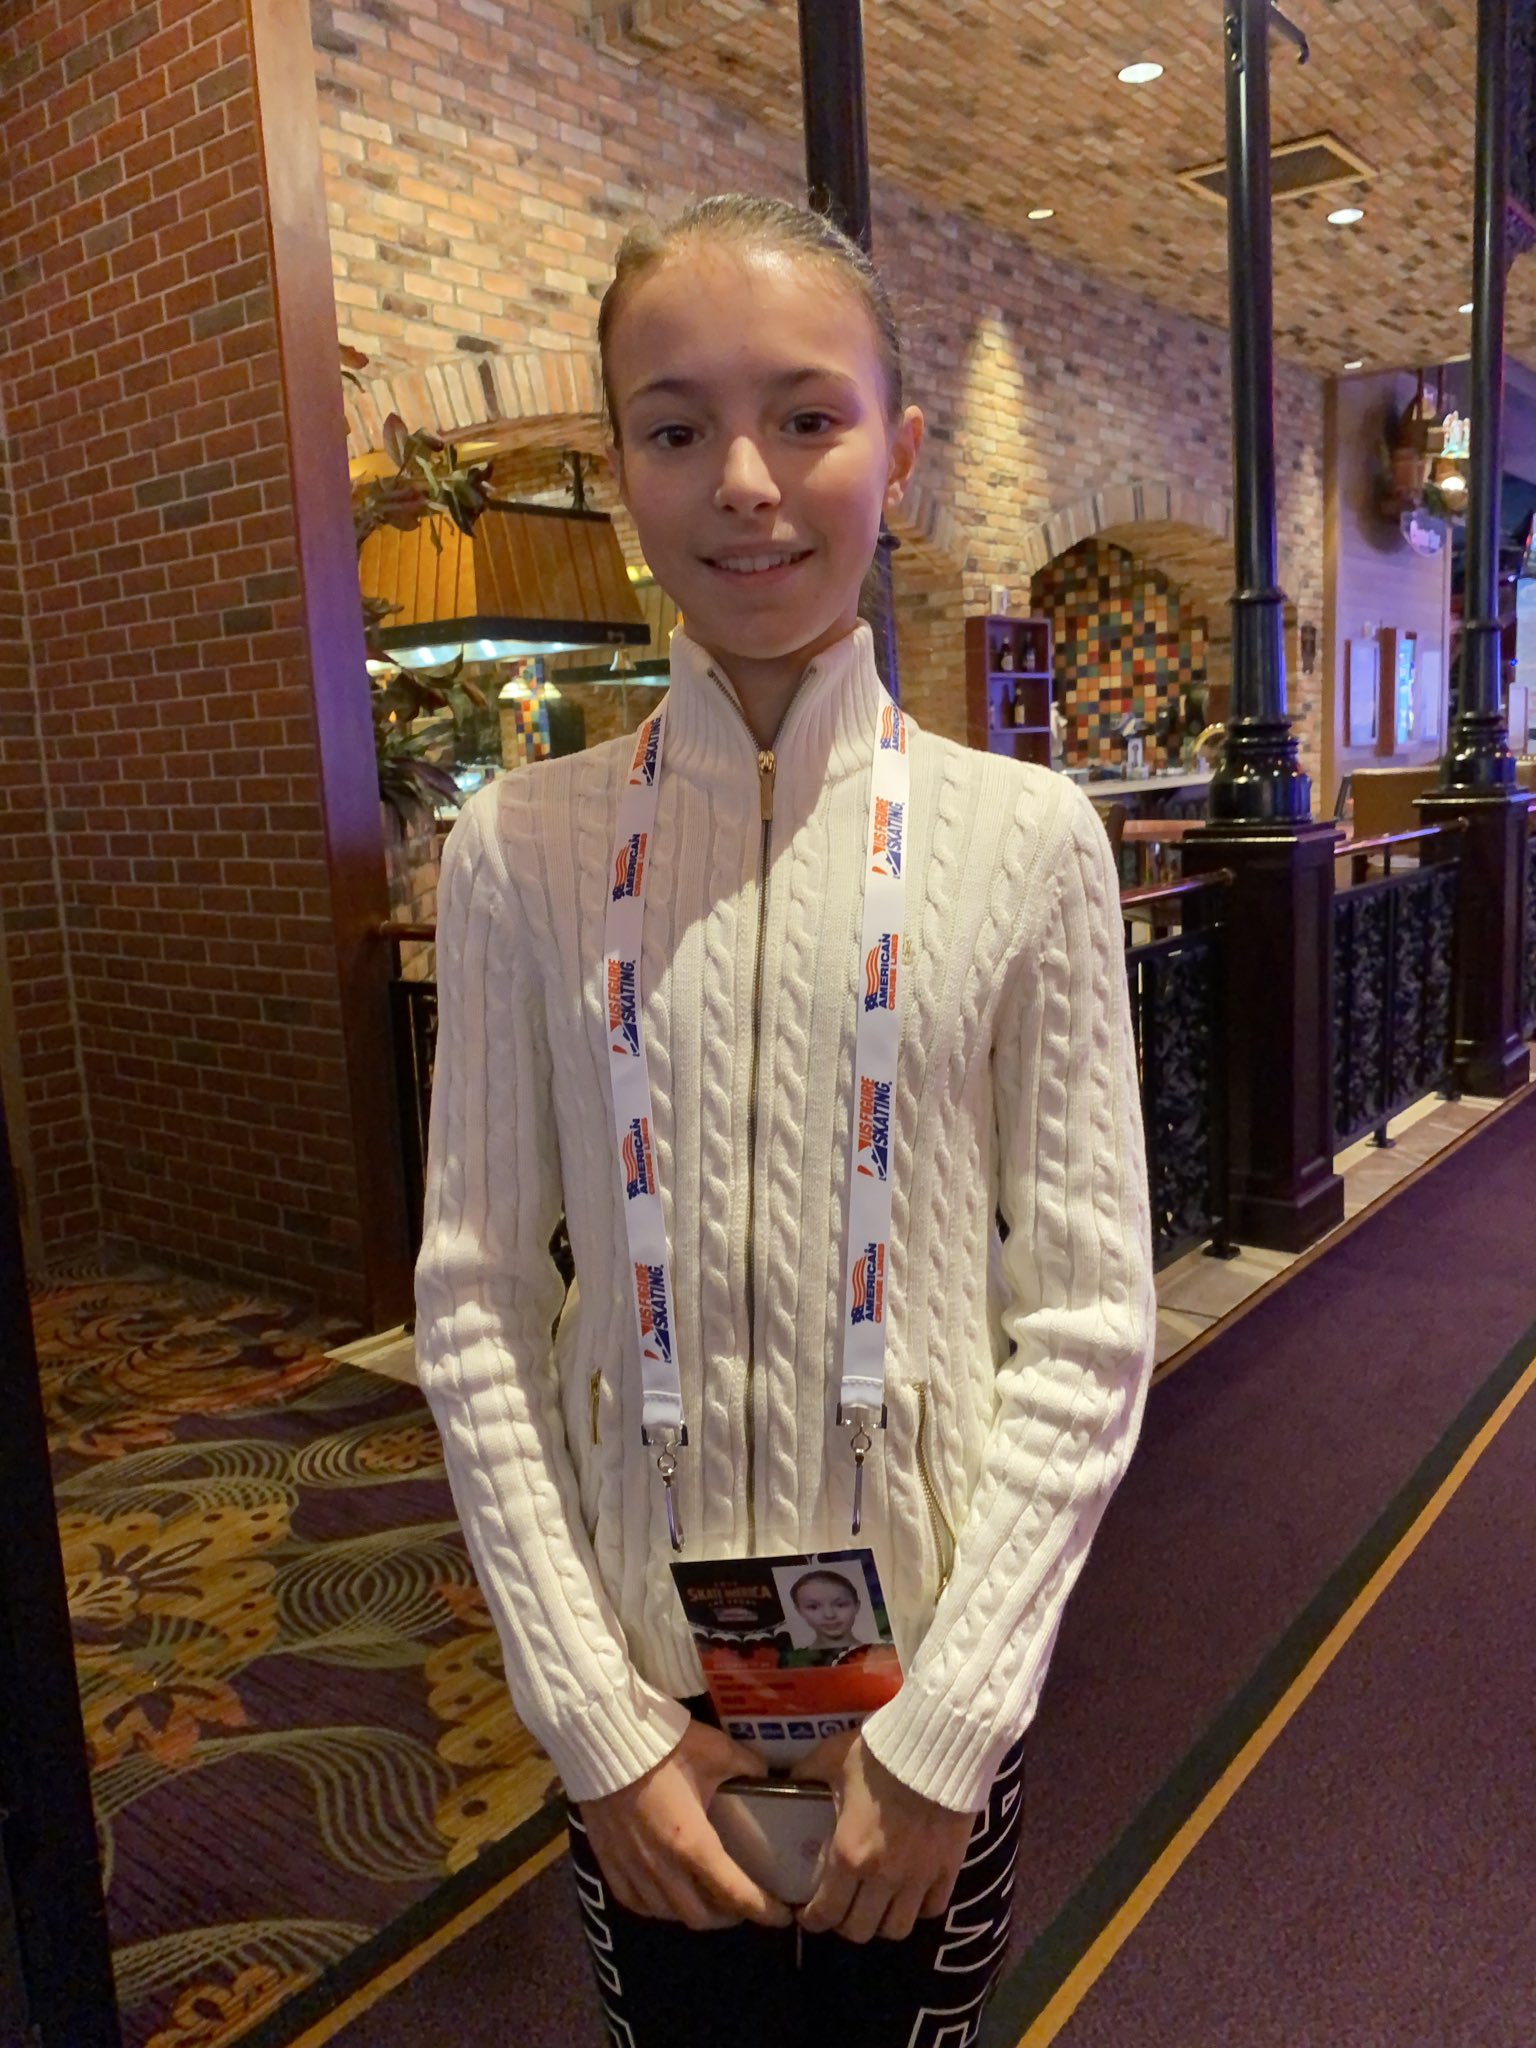 GP - 1 этап. Skate America Las Vegas, NV / USA October 18-20, 2019   - Страница 3 EHFyL_RW4AARVoJ?format=jpg&name=4096x4096